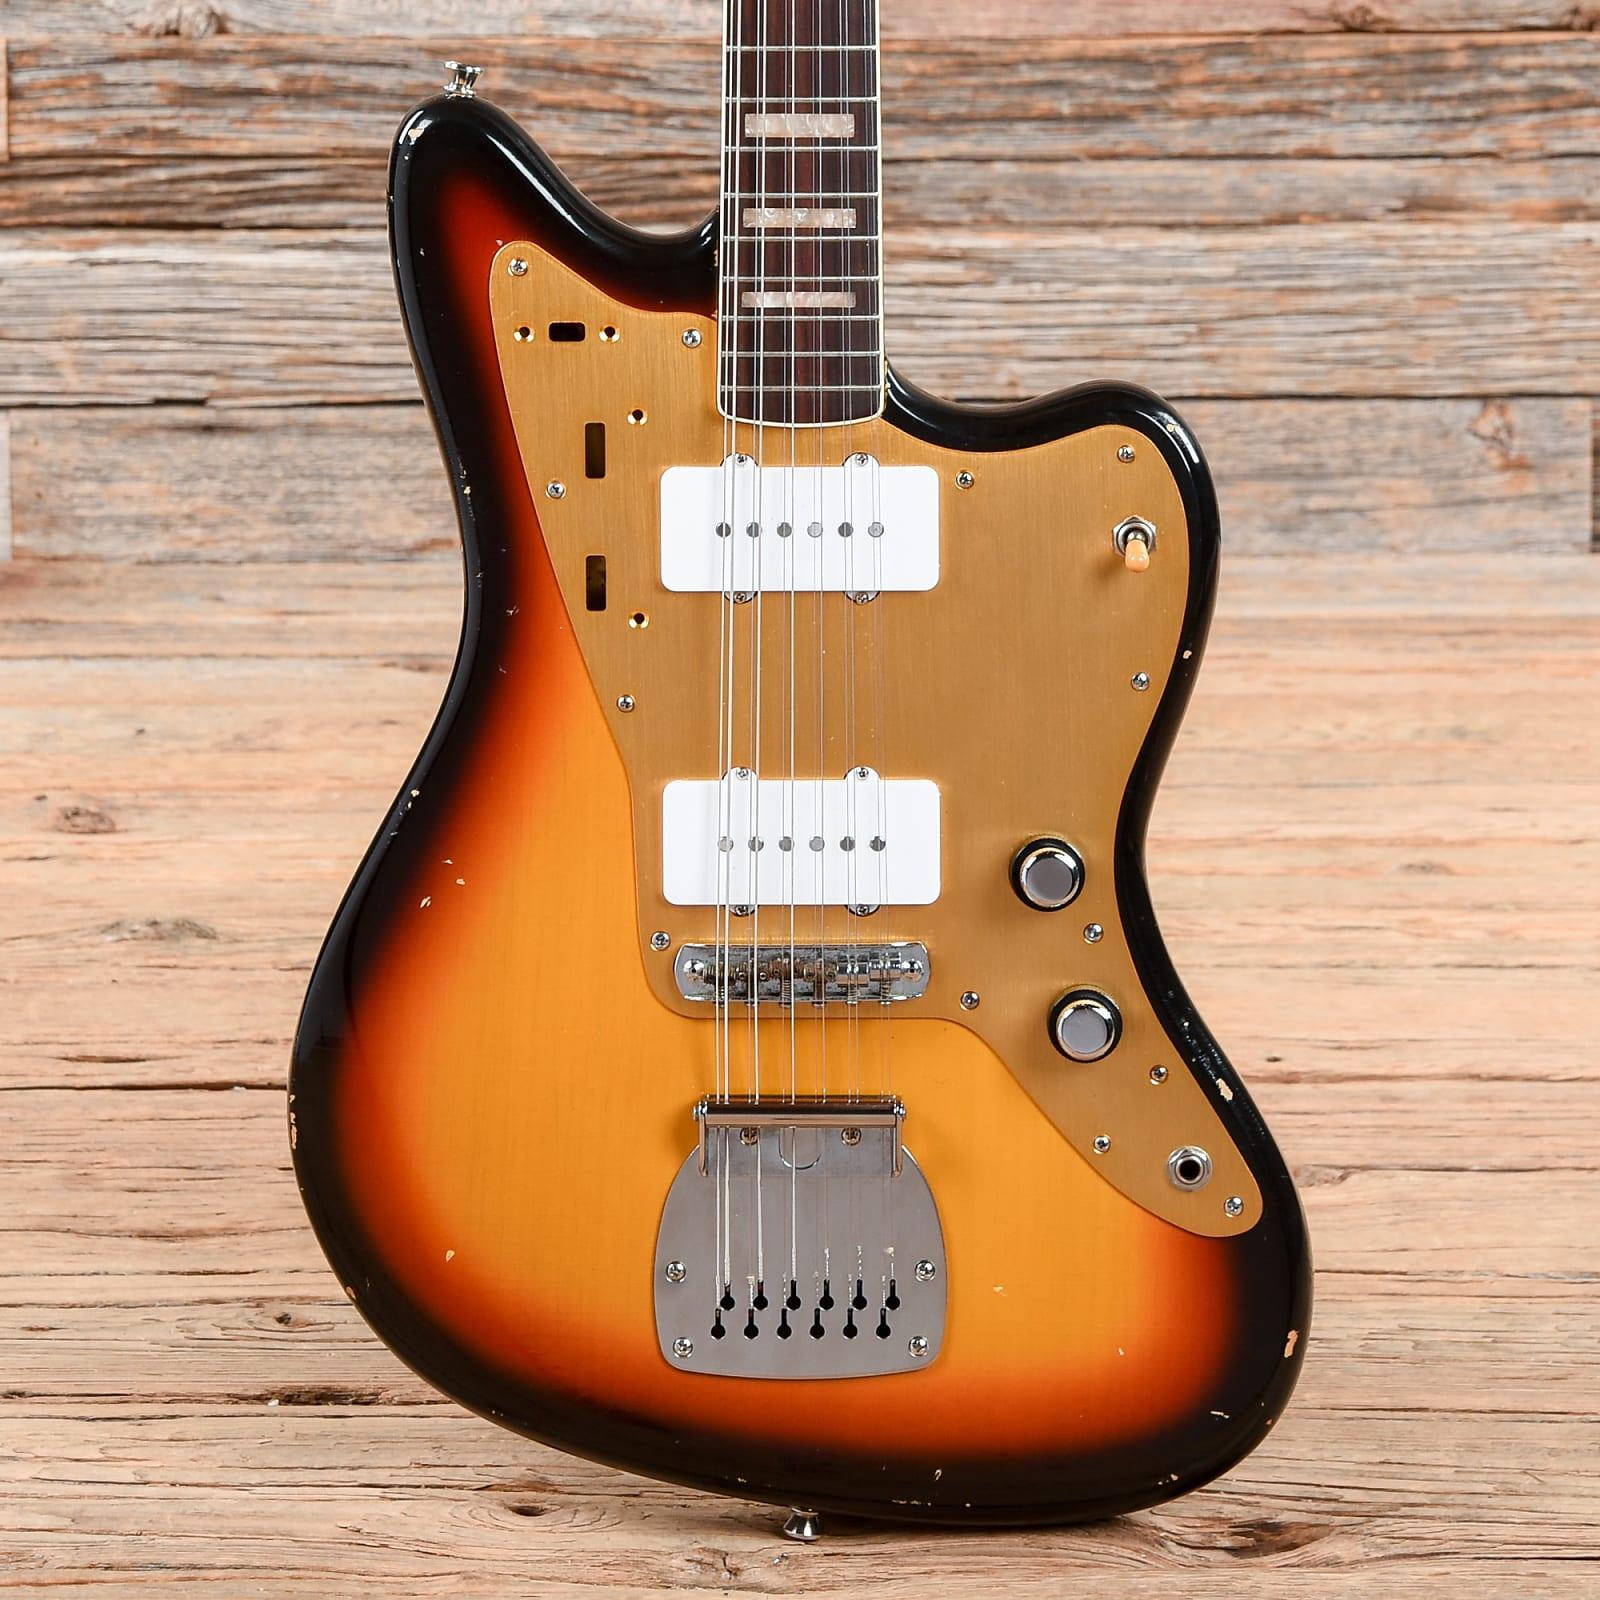 Fender Jazzmaster / Coronado XII Sunburst 1960s